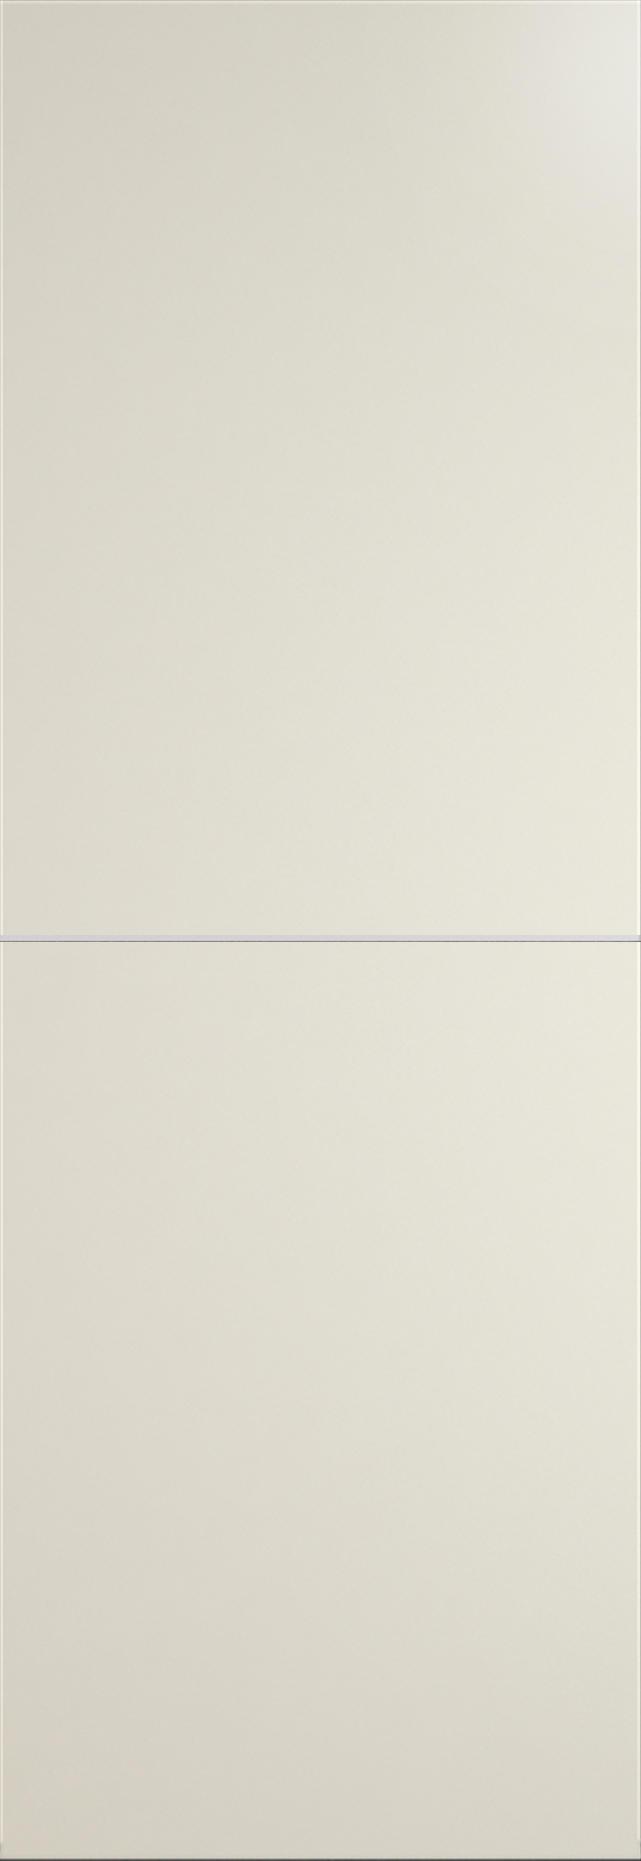 Tivoli Б-3 Invisible цвет - Жемчужная эмаль Без стекла (ДГ)